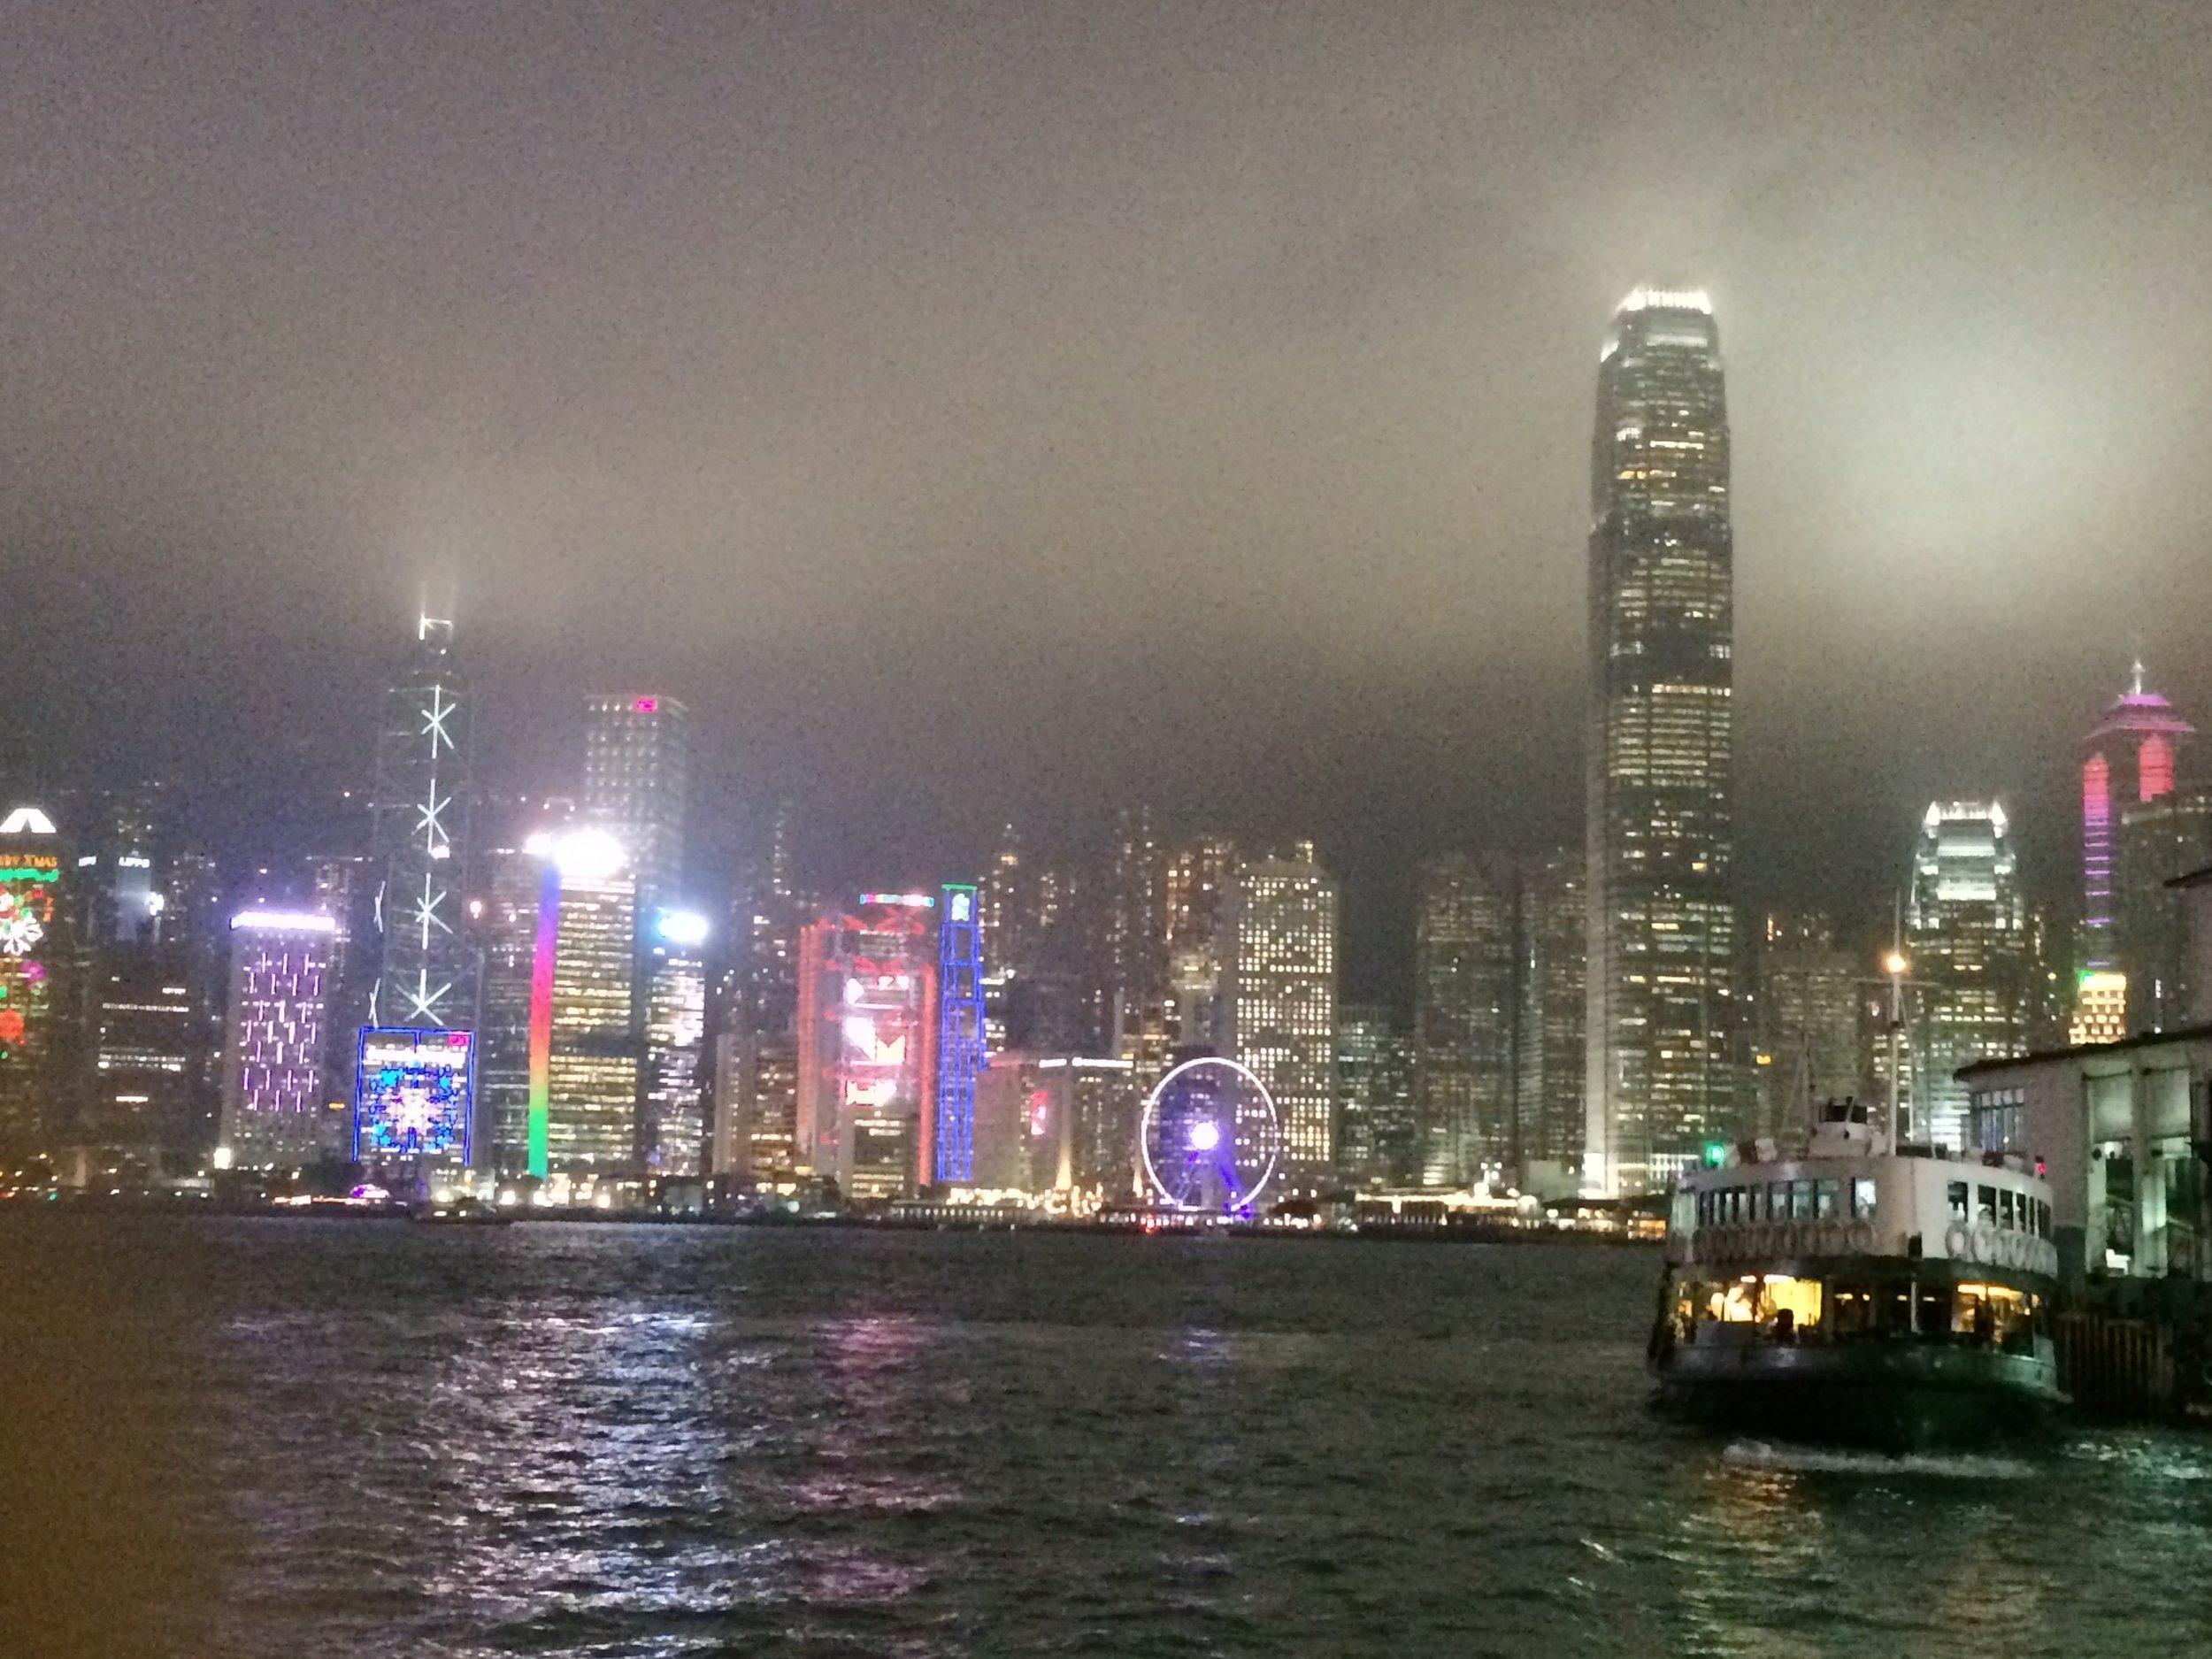 Hong Kong Island, as seen from Kowloon